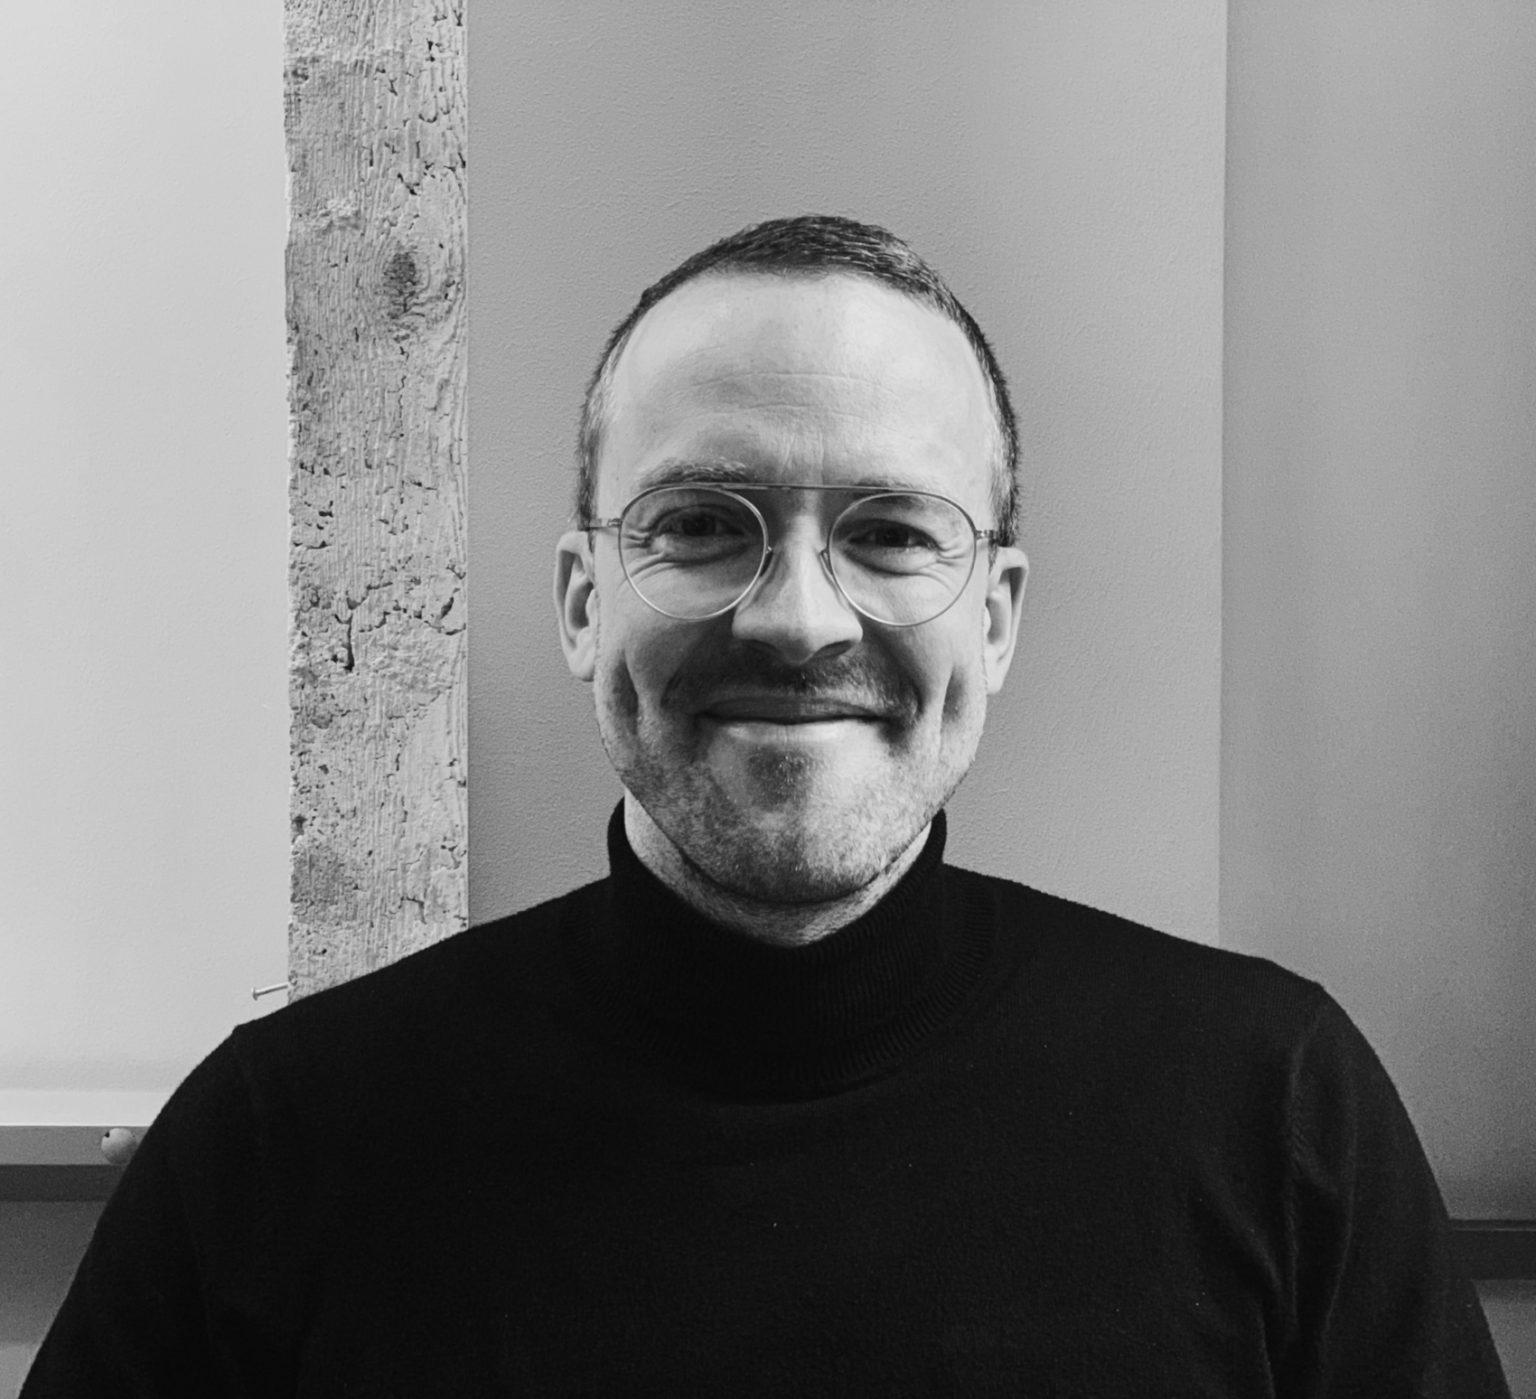 Markus Dalka